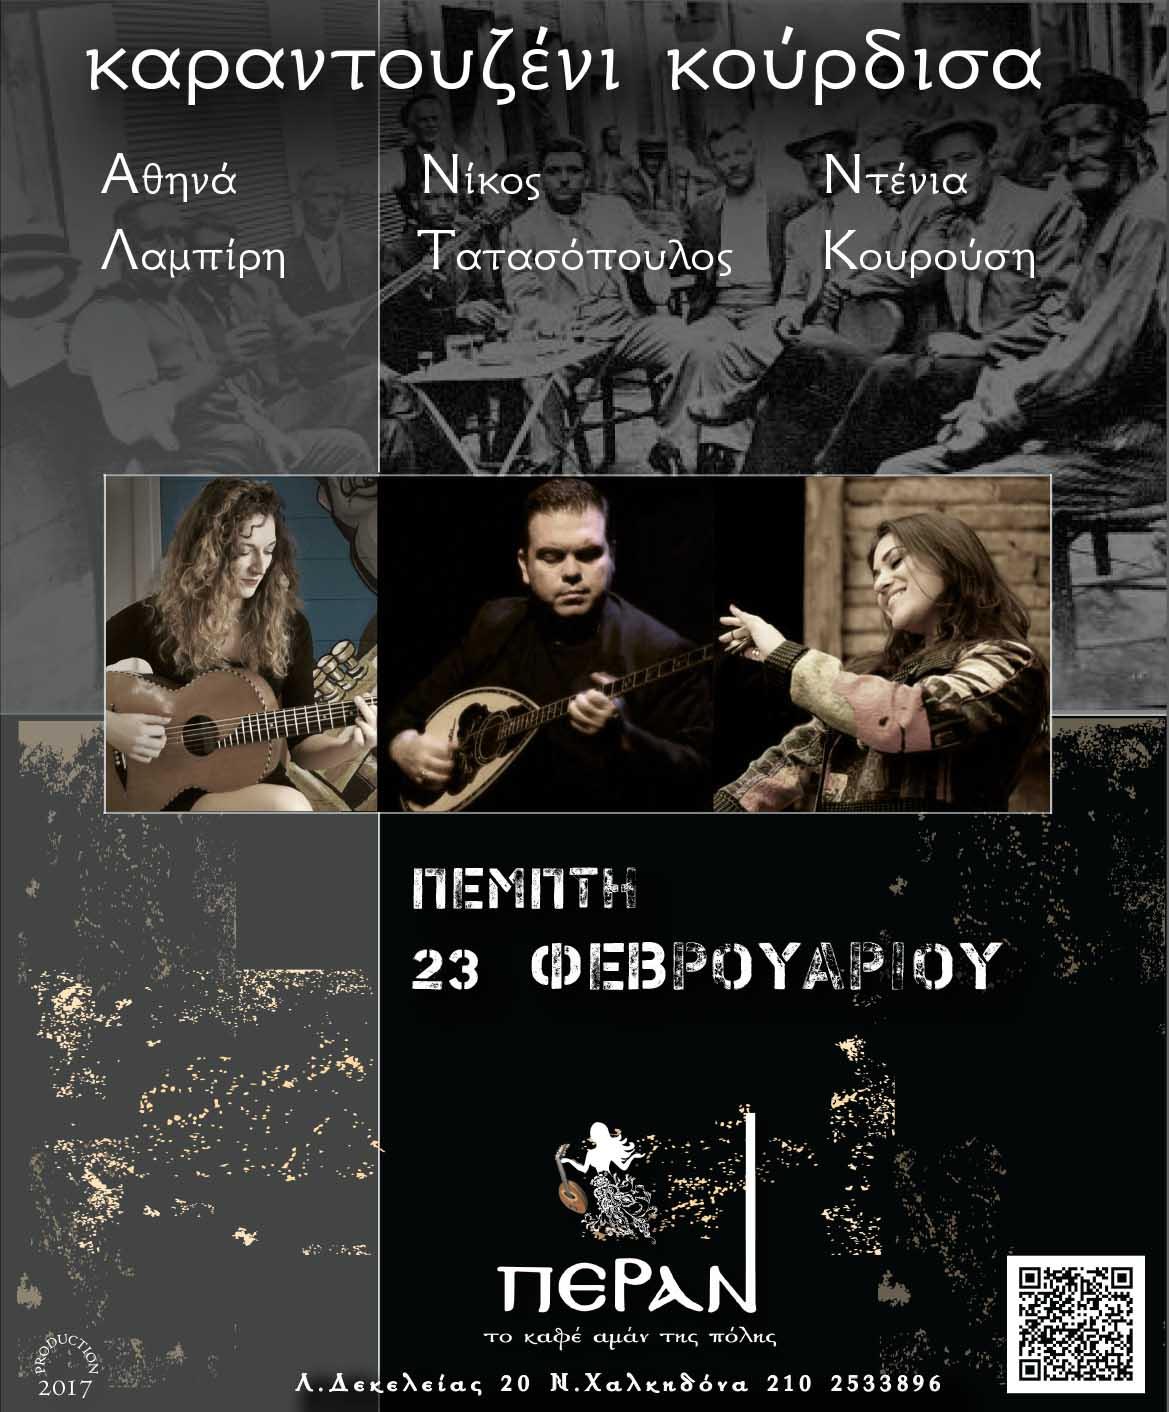 TATASOPOYLOS-KOYROYSI 23-2